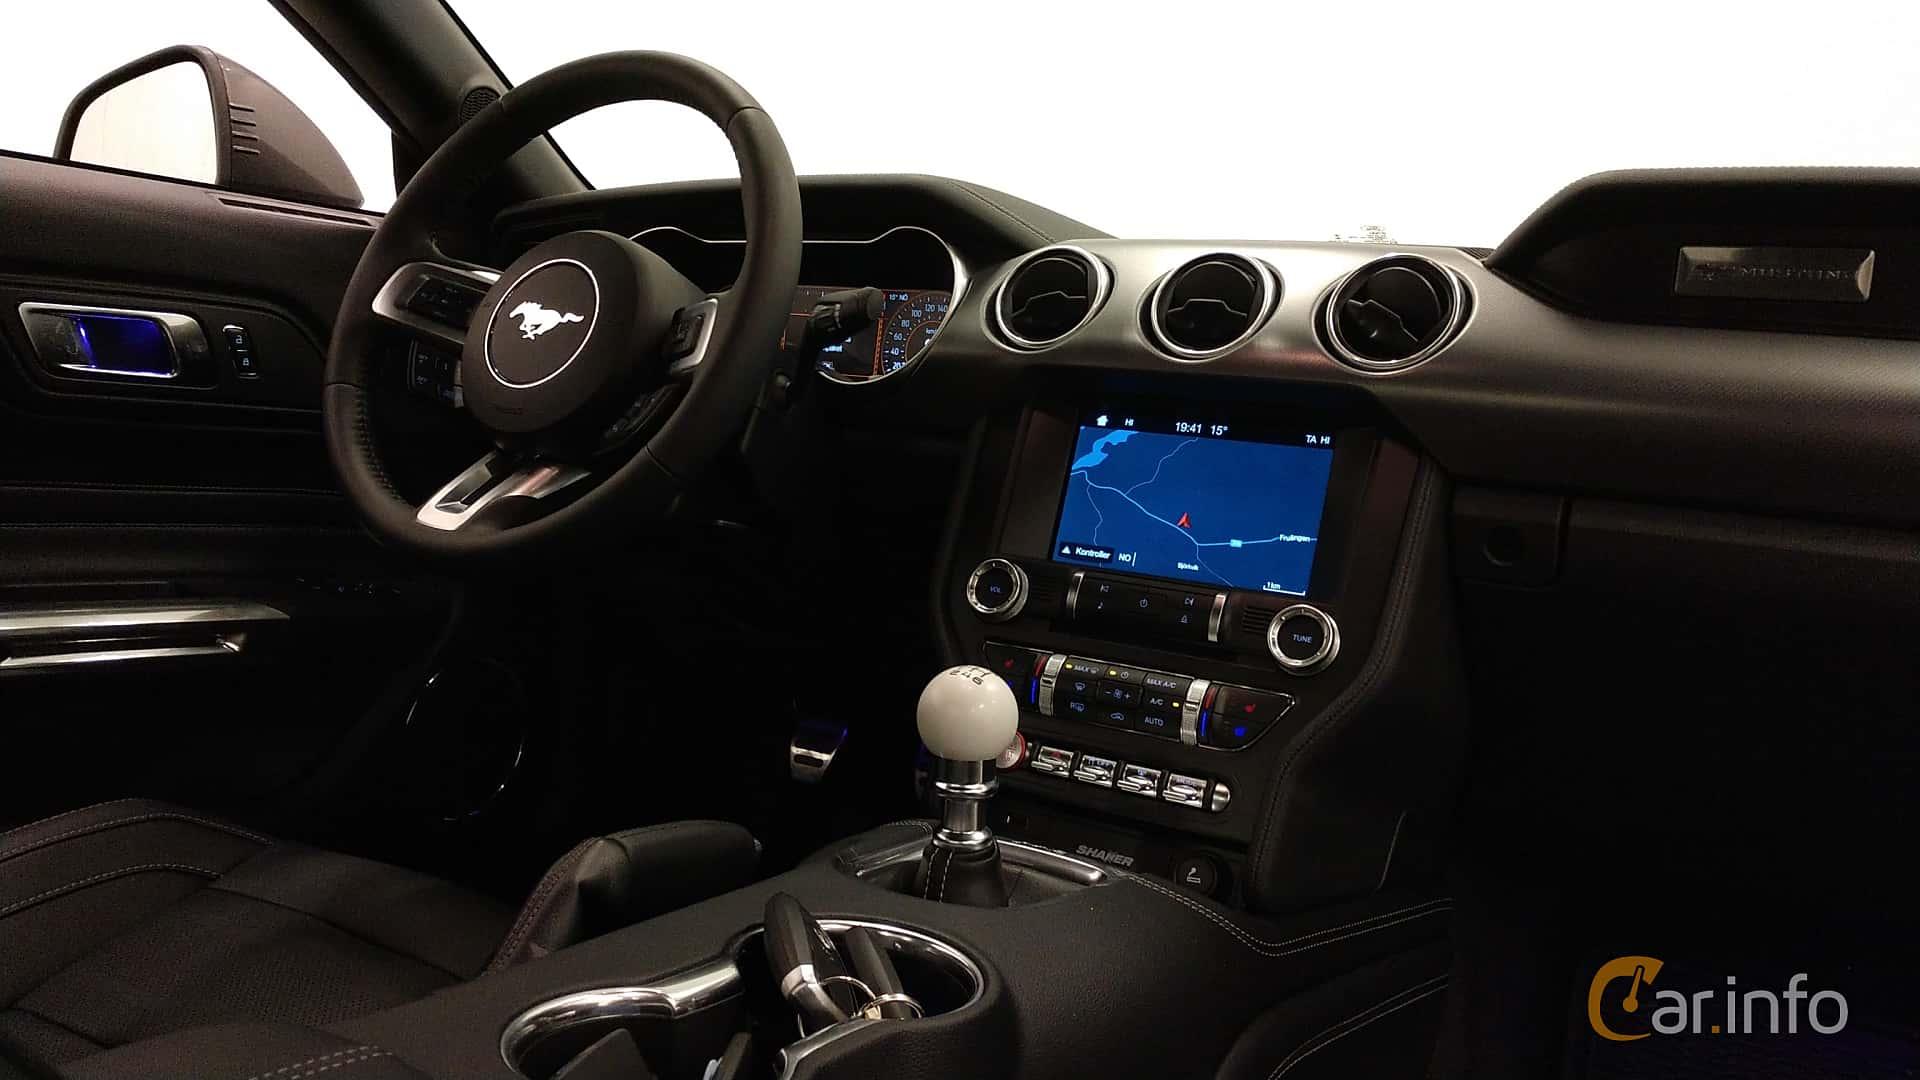 Ford Mustang GT 5.0 V8 Manual, 457hp, 2018